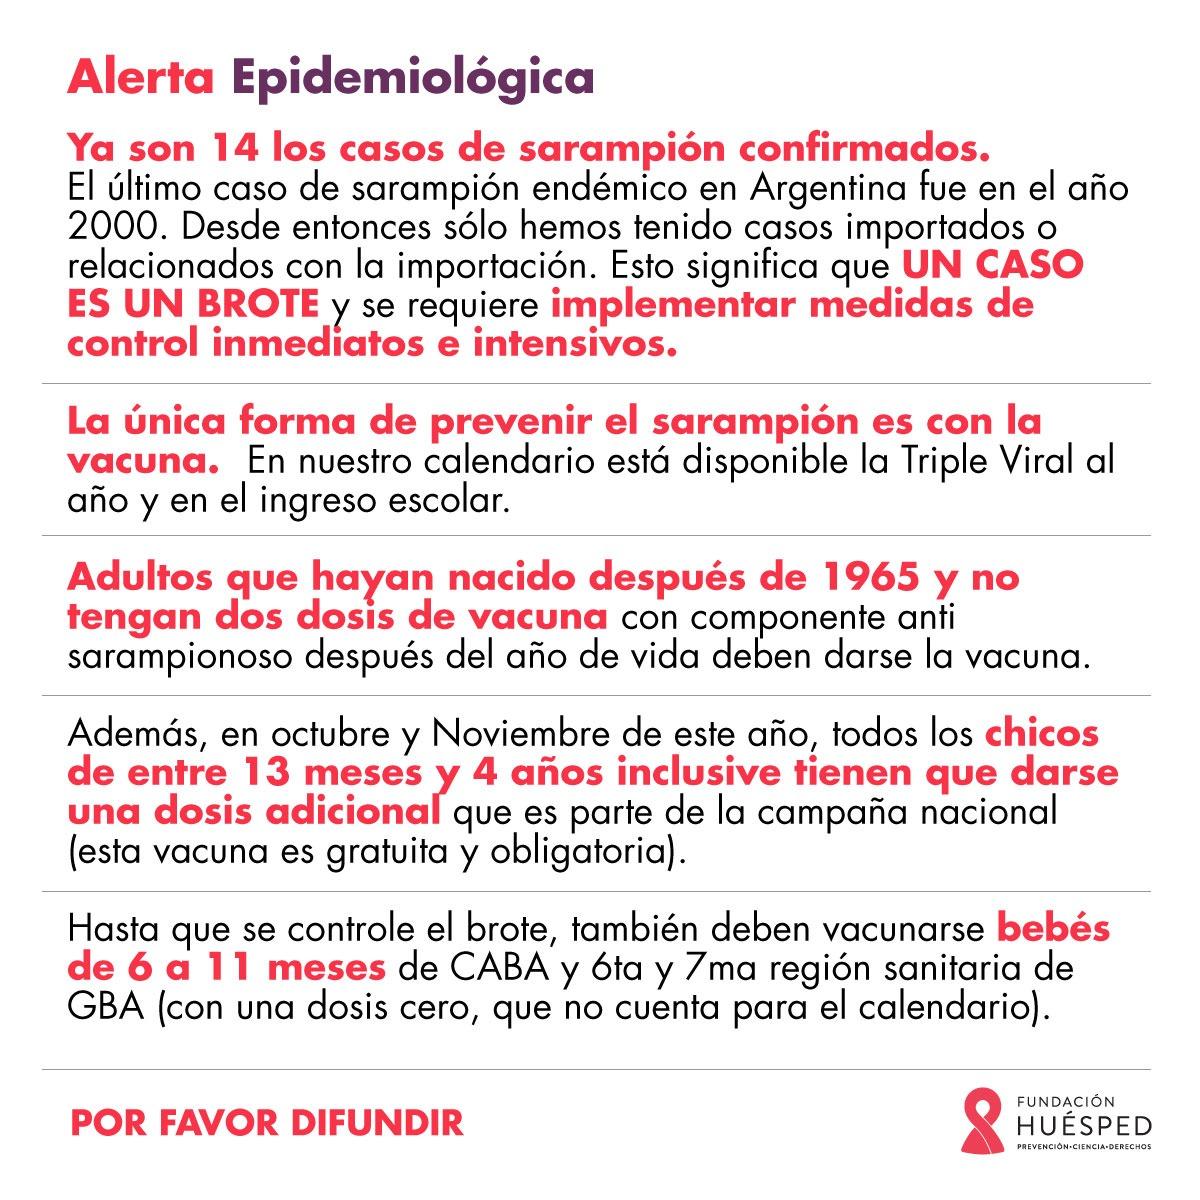 Alerta epidemiológica Sarampión